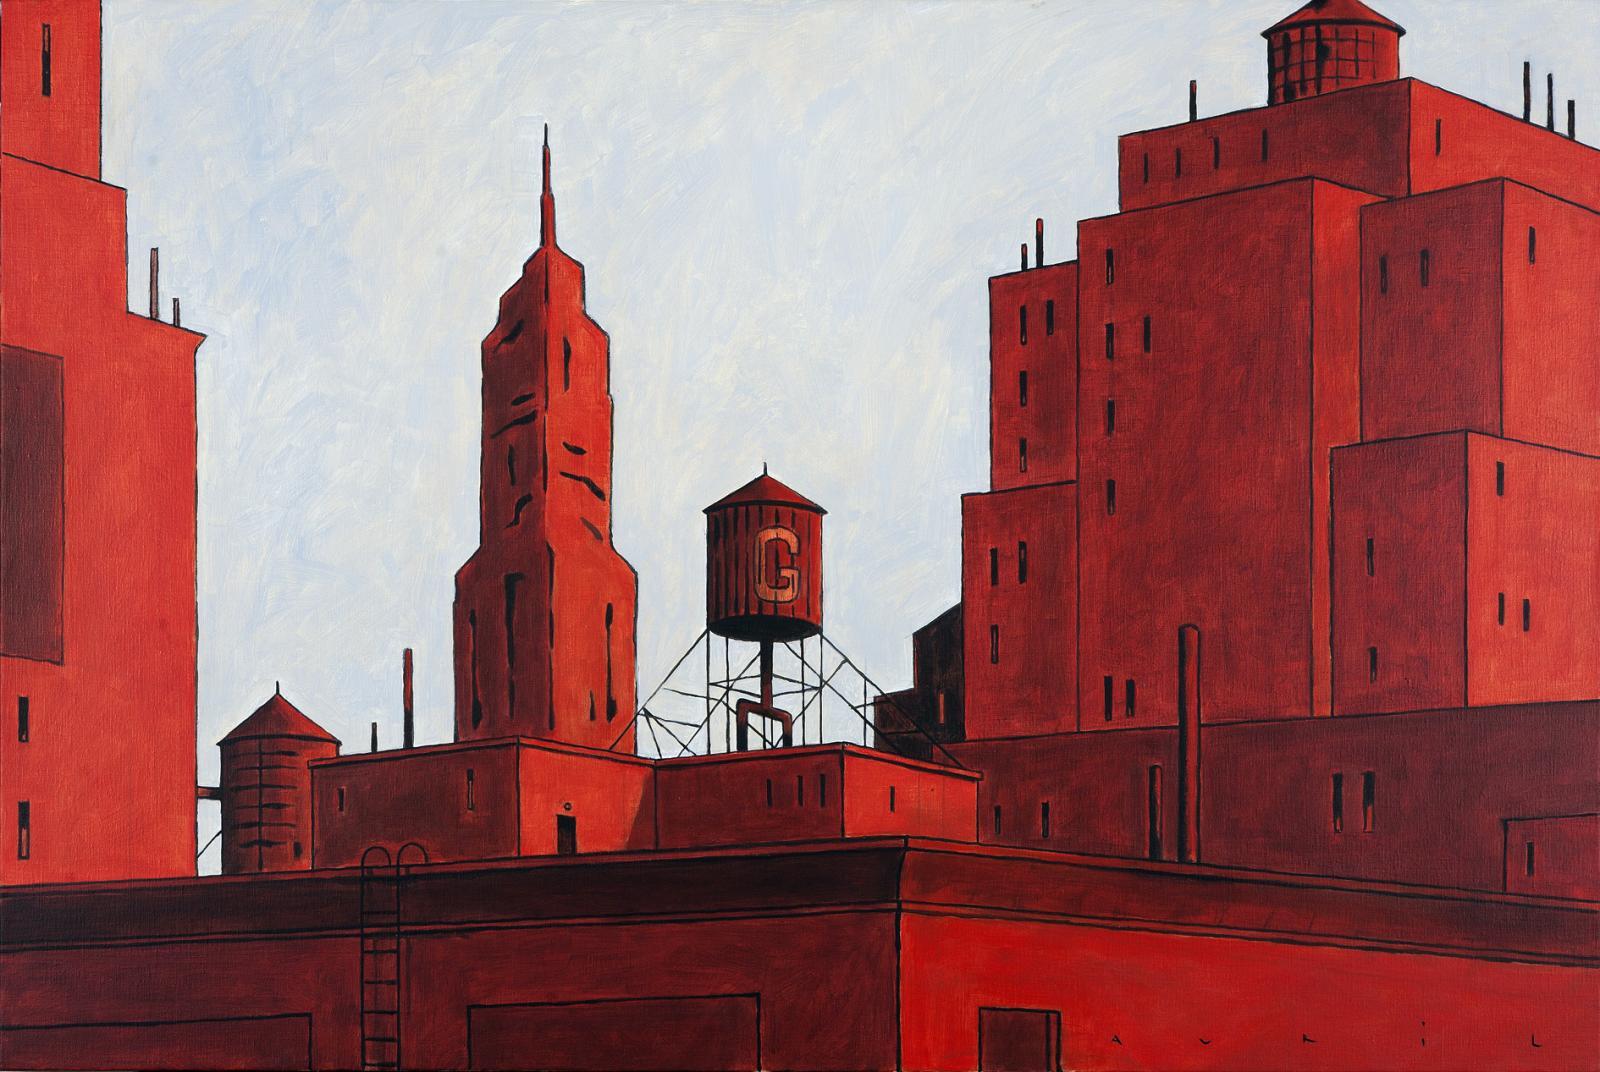 François Avril, New York rouge, 2011, acrylique sur toile, 97 x 146 cm. © françois avril courtesy huberty-breyne gallery